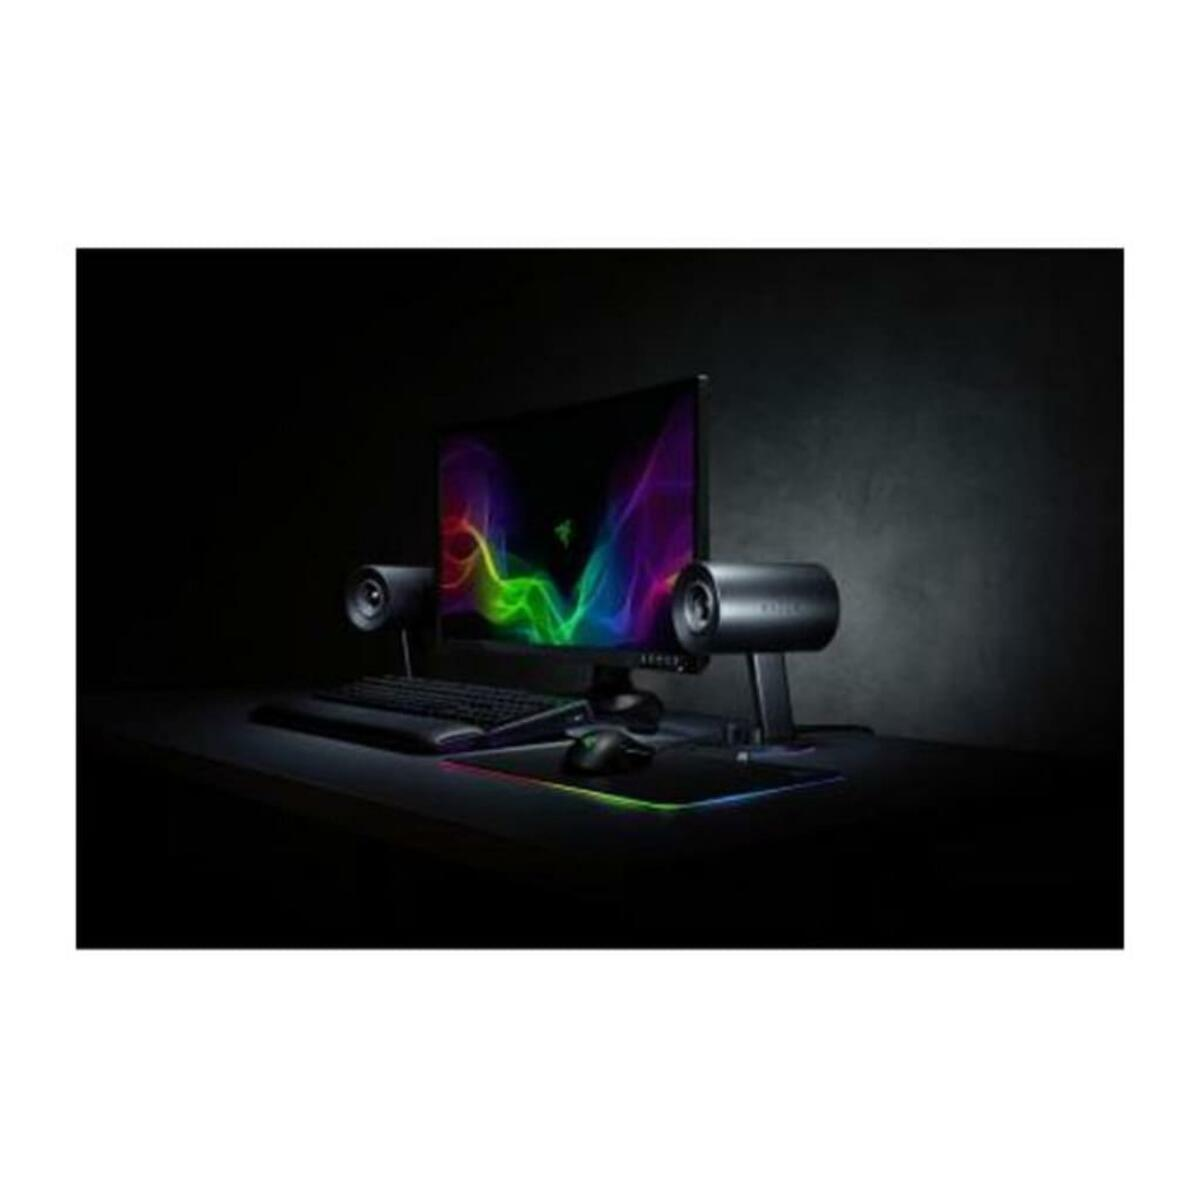 Bild 3 von RAZER Nommo 2.0 Chroma (RZ05-02460100-R3G1), Farbe:Chroma